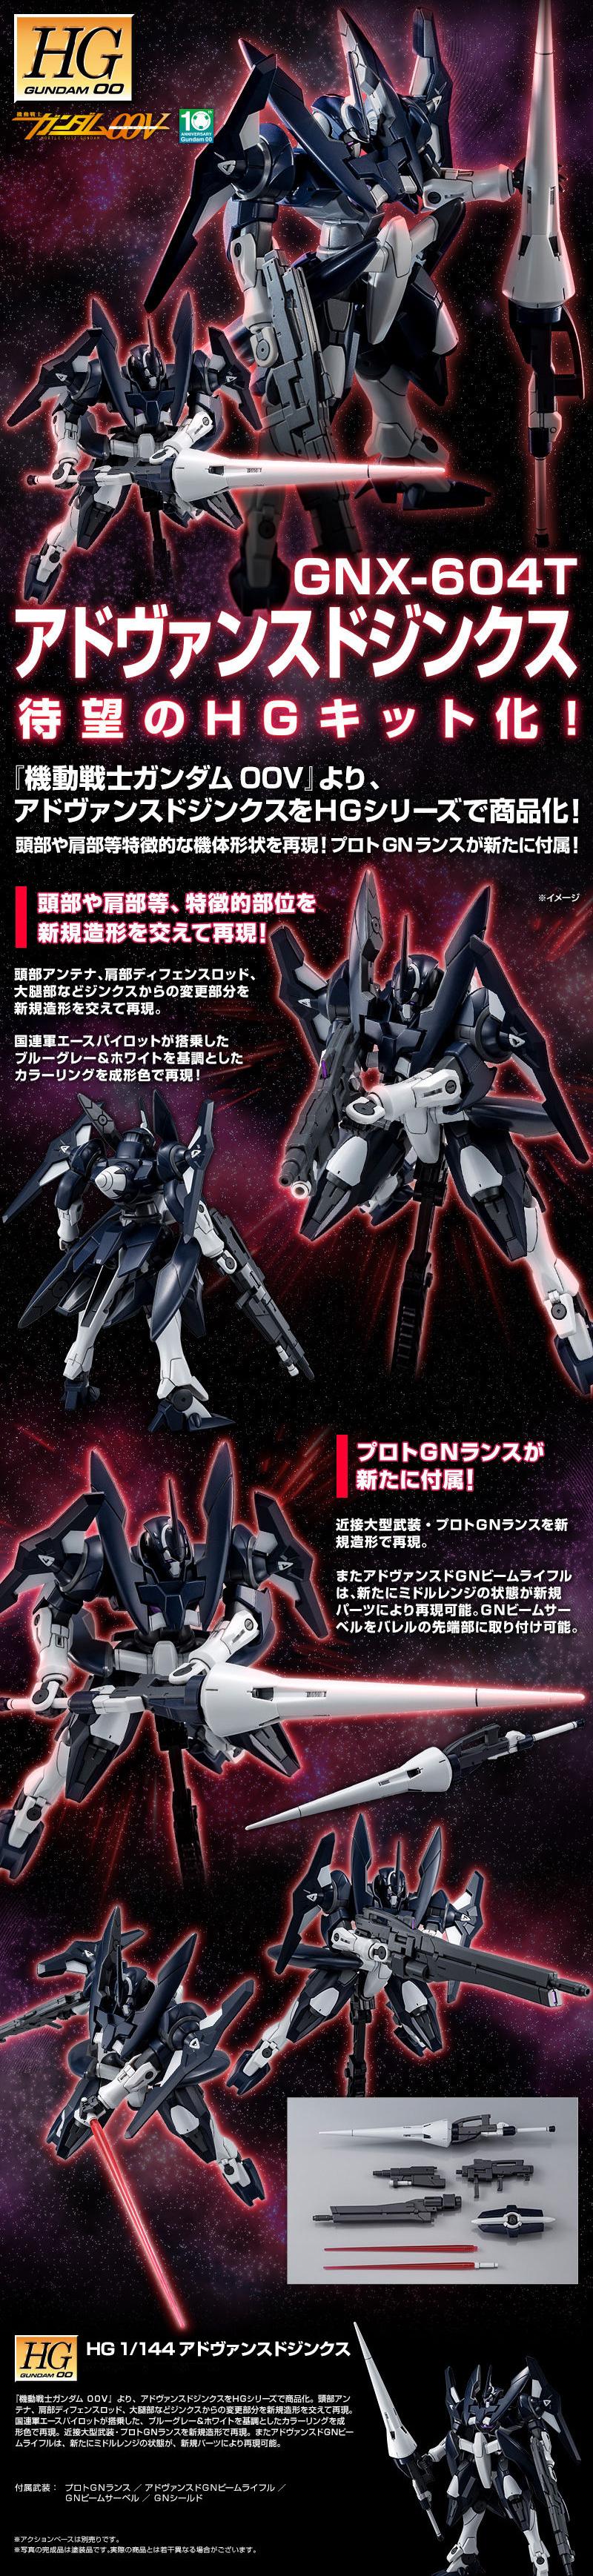 HG00 Advanced GN-X Details